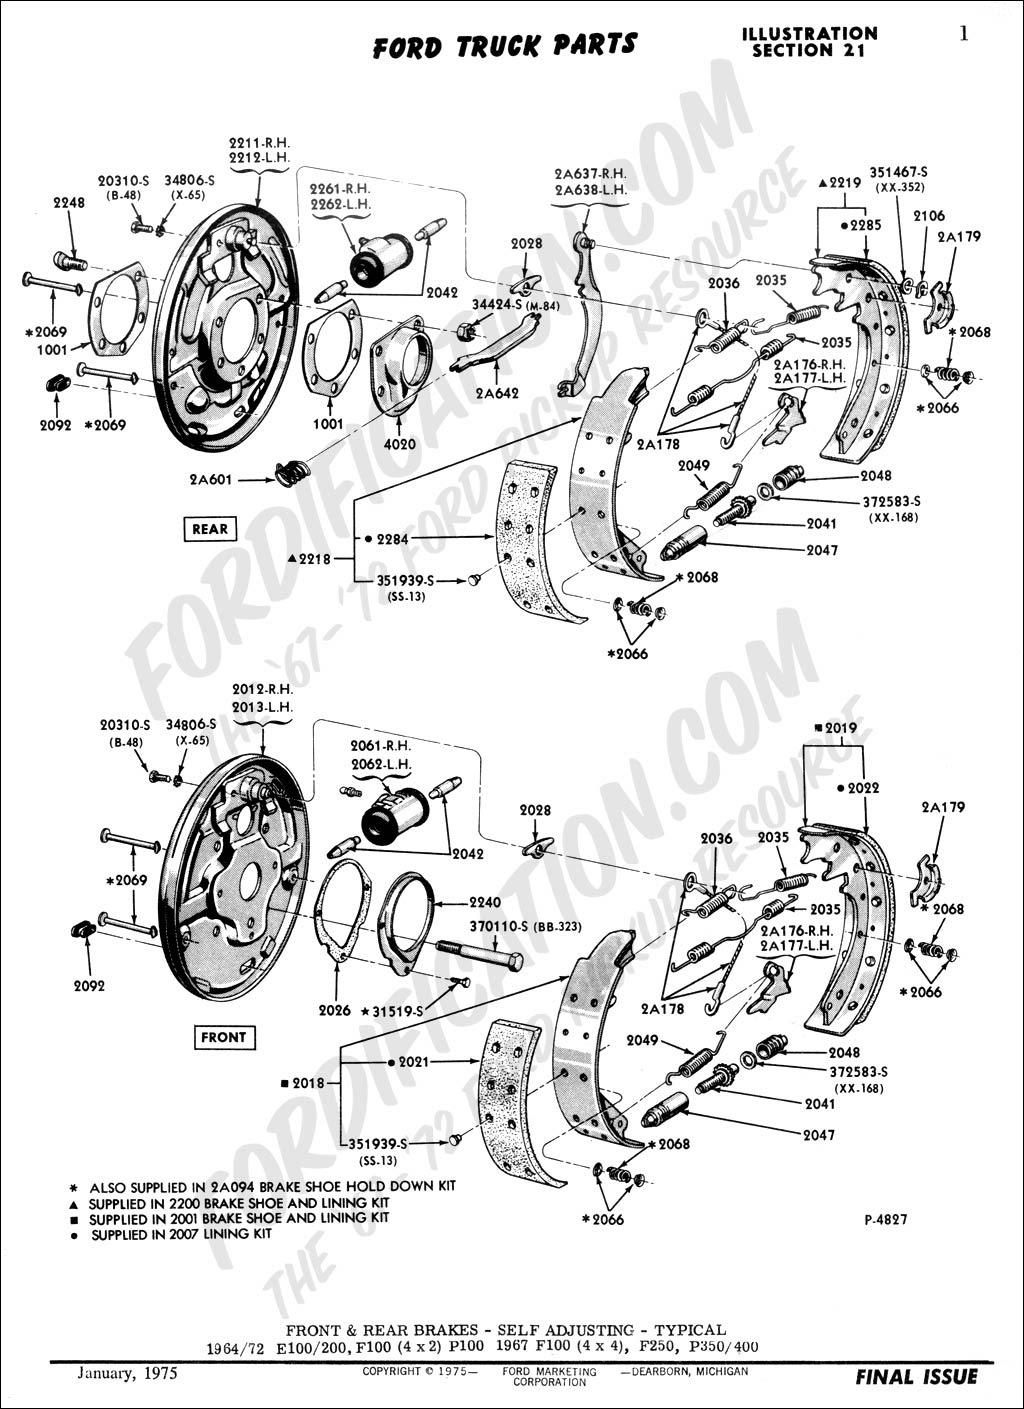 Ford F800 Brake Diagram Wiring Diagram Shut Pair Shut Pair Zaafran It